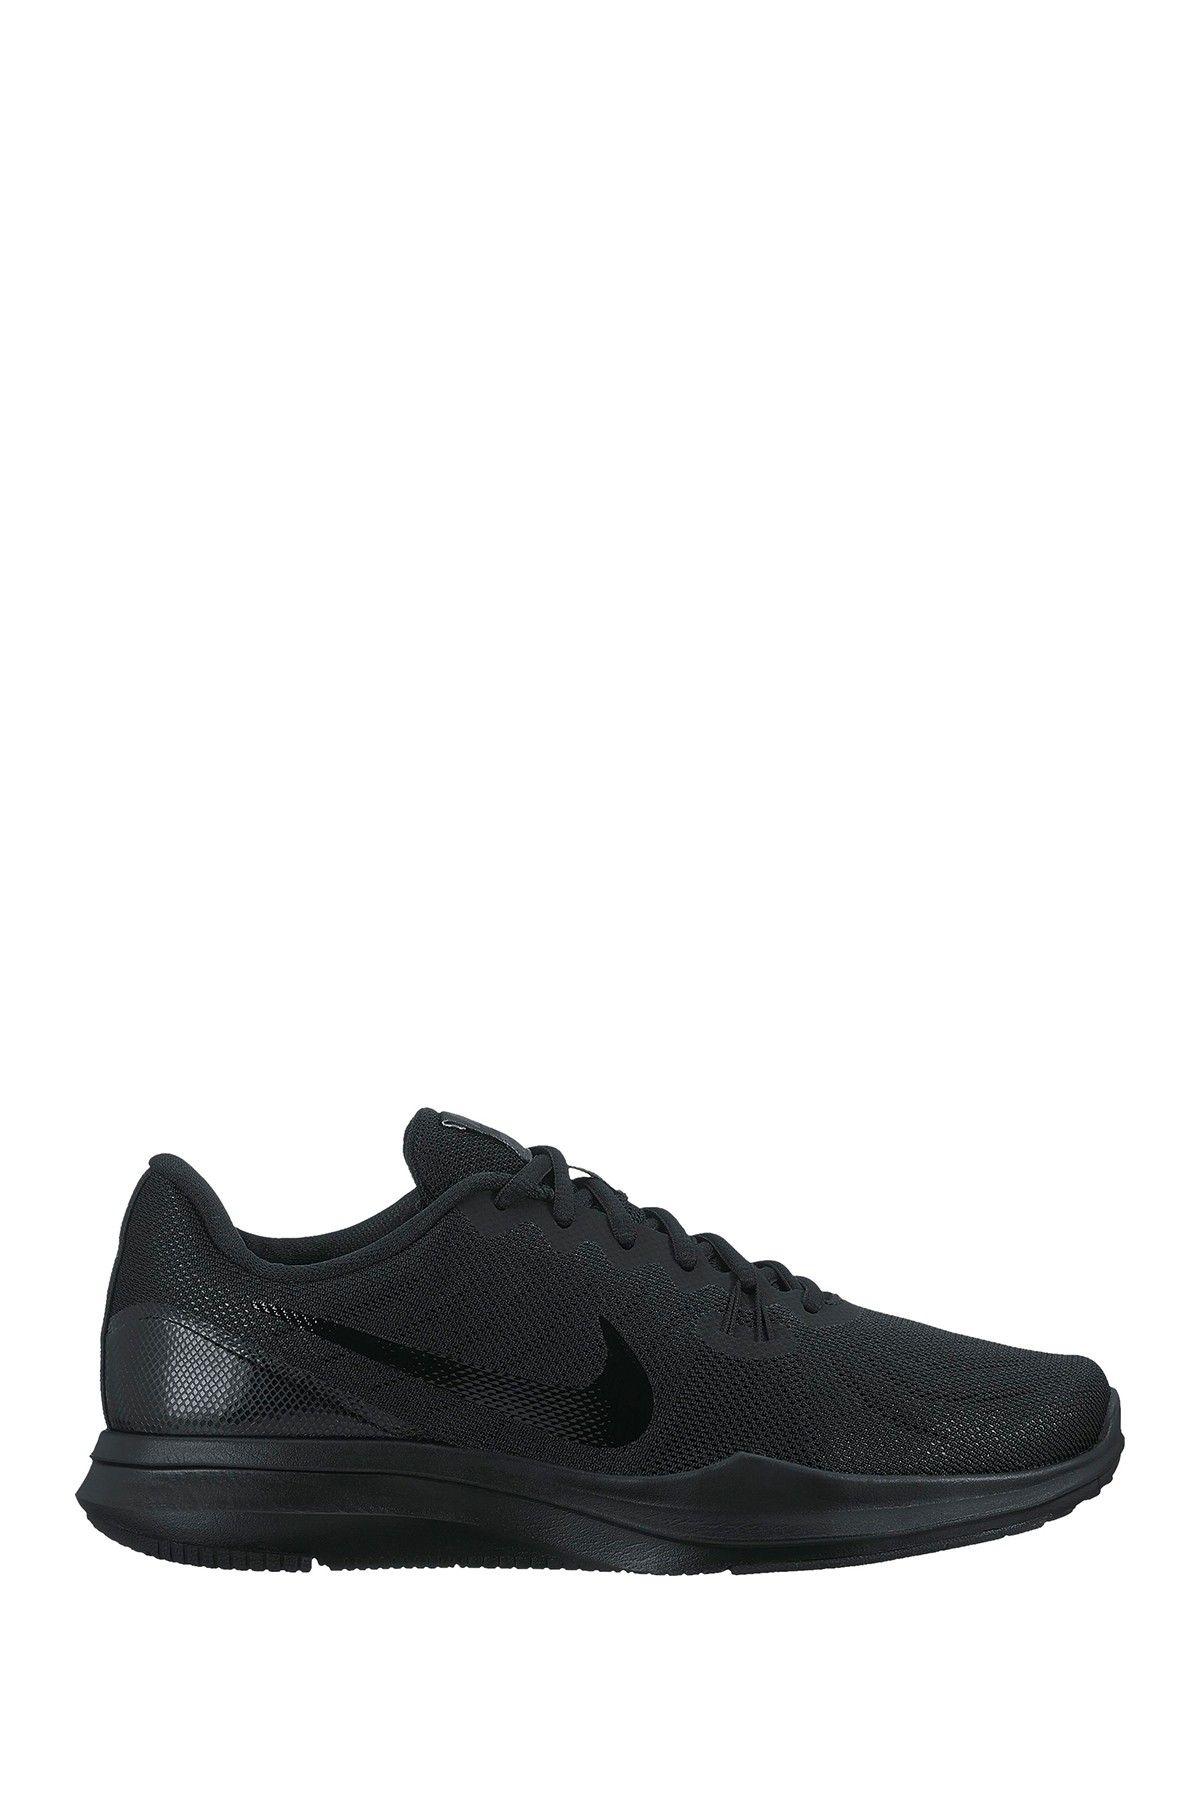 63b8ccedcd1 In-Season Training Sneaker by Nike on  nordstrom rack